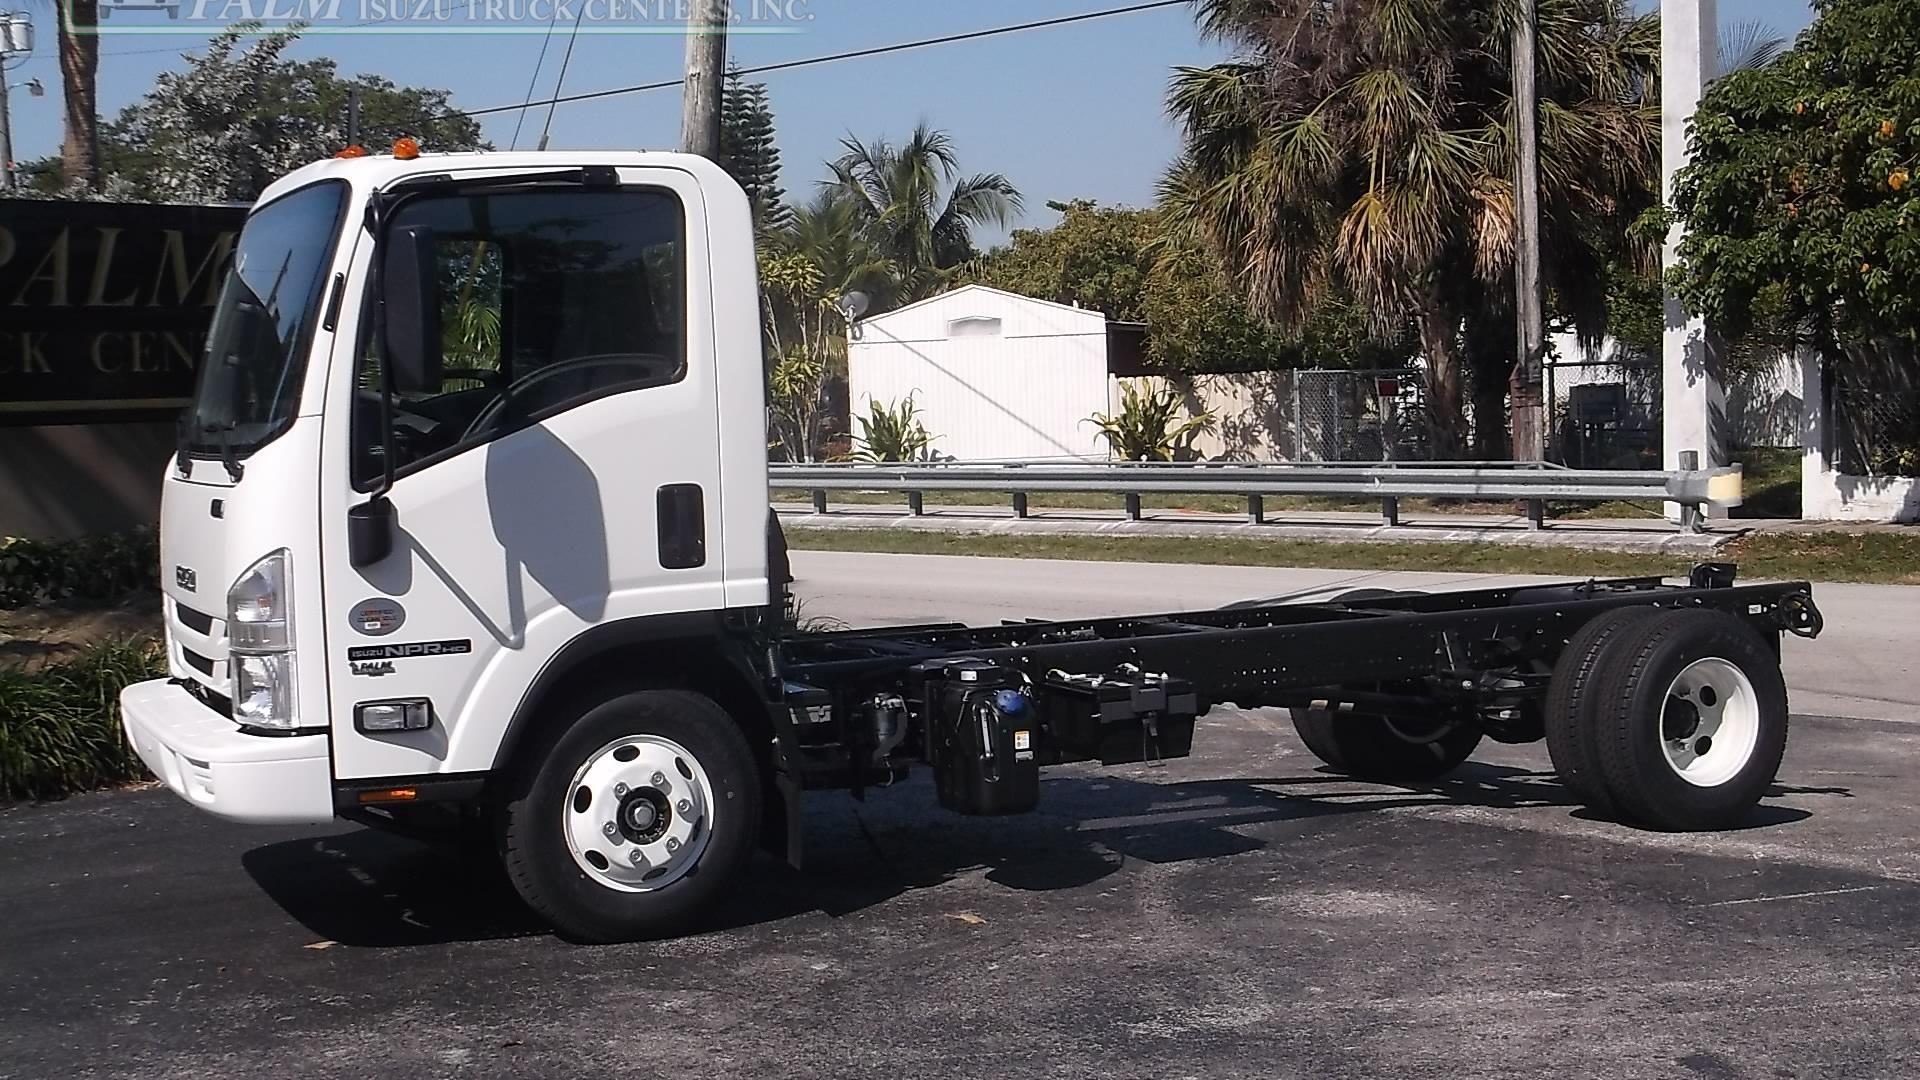 23 Isuzu Trucks For Sale Ideas Trucks For Sale Trucks Florida